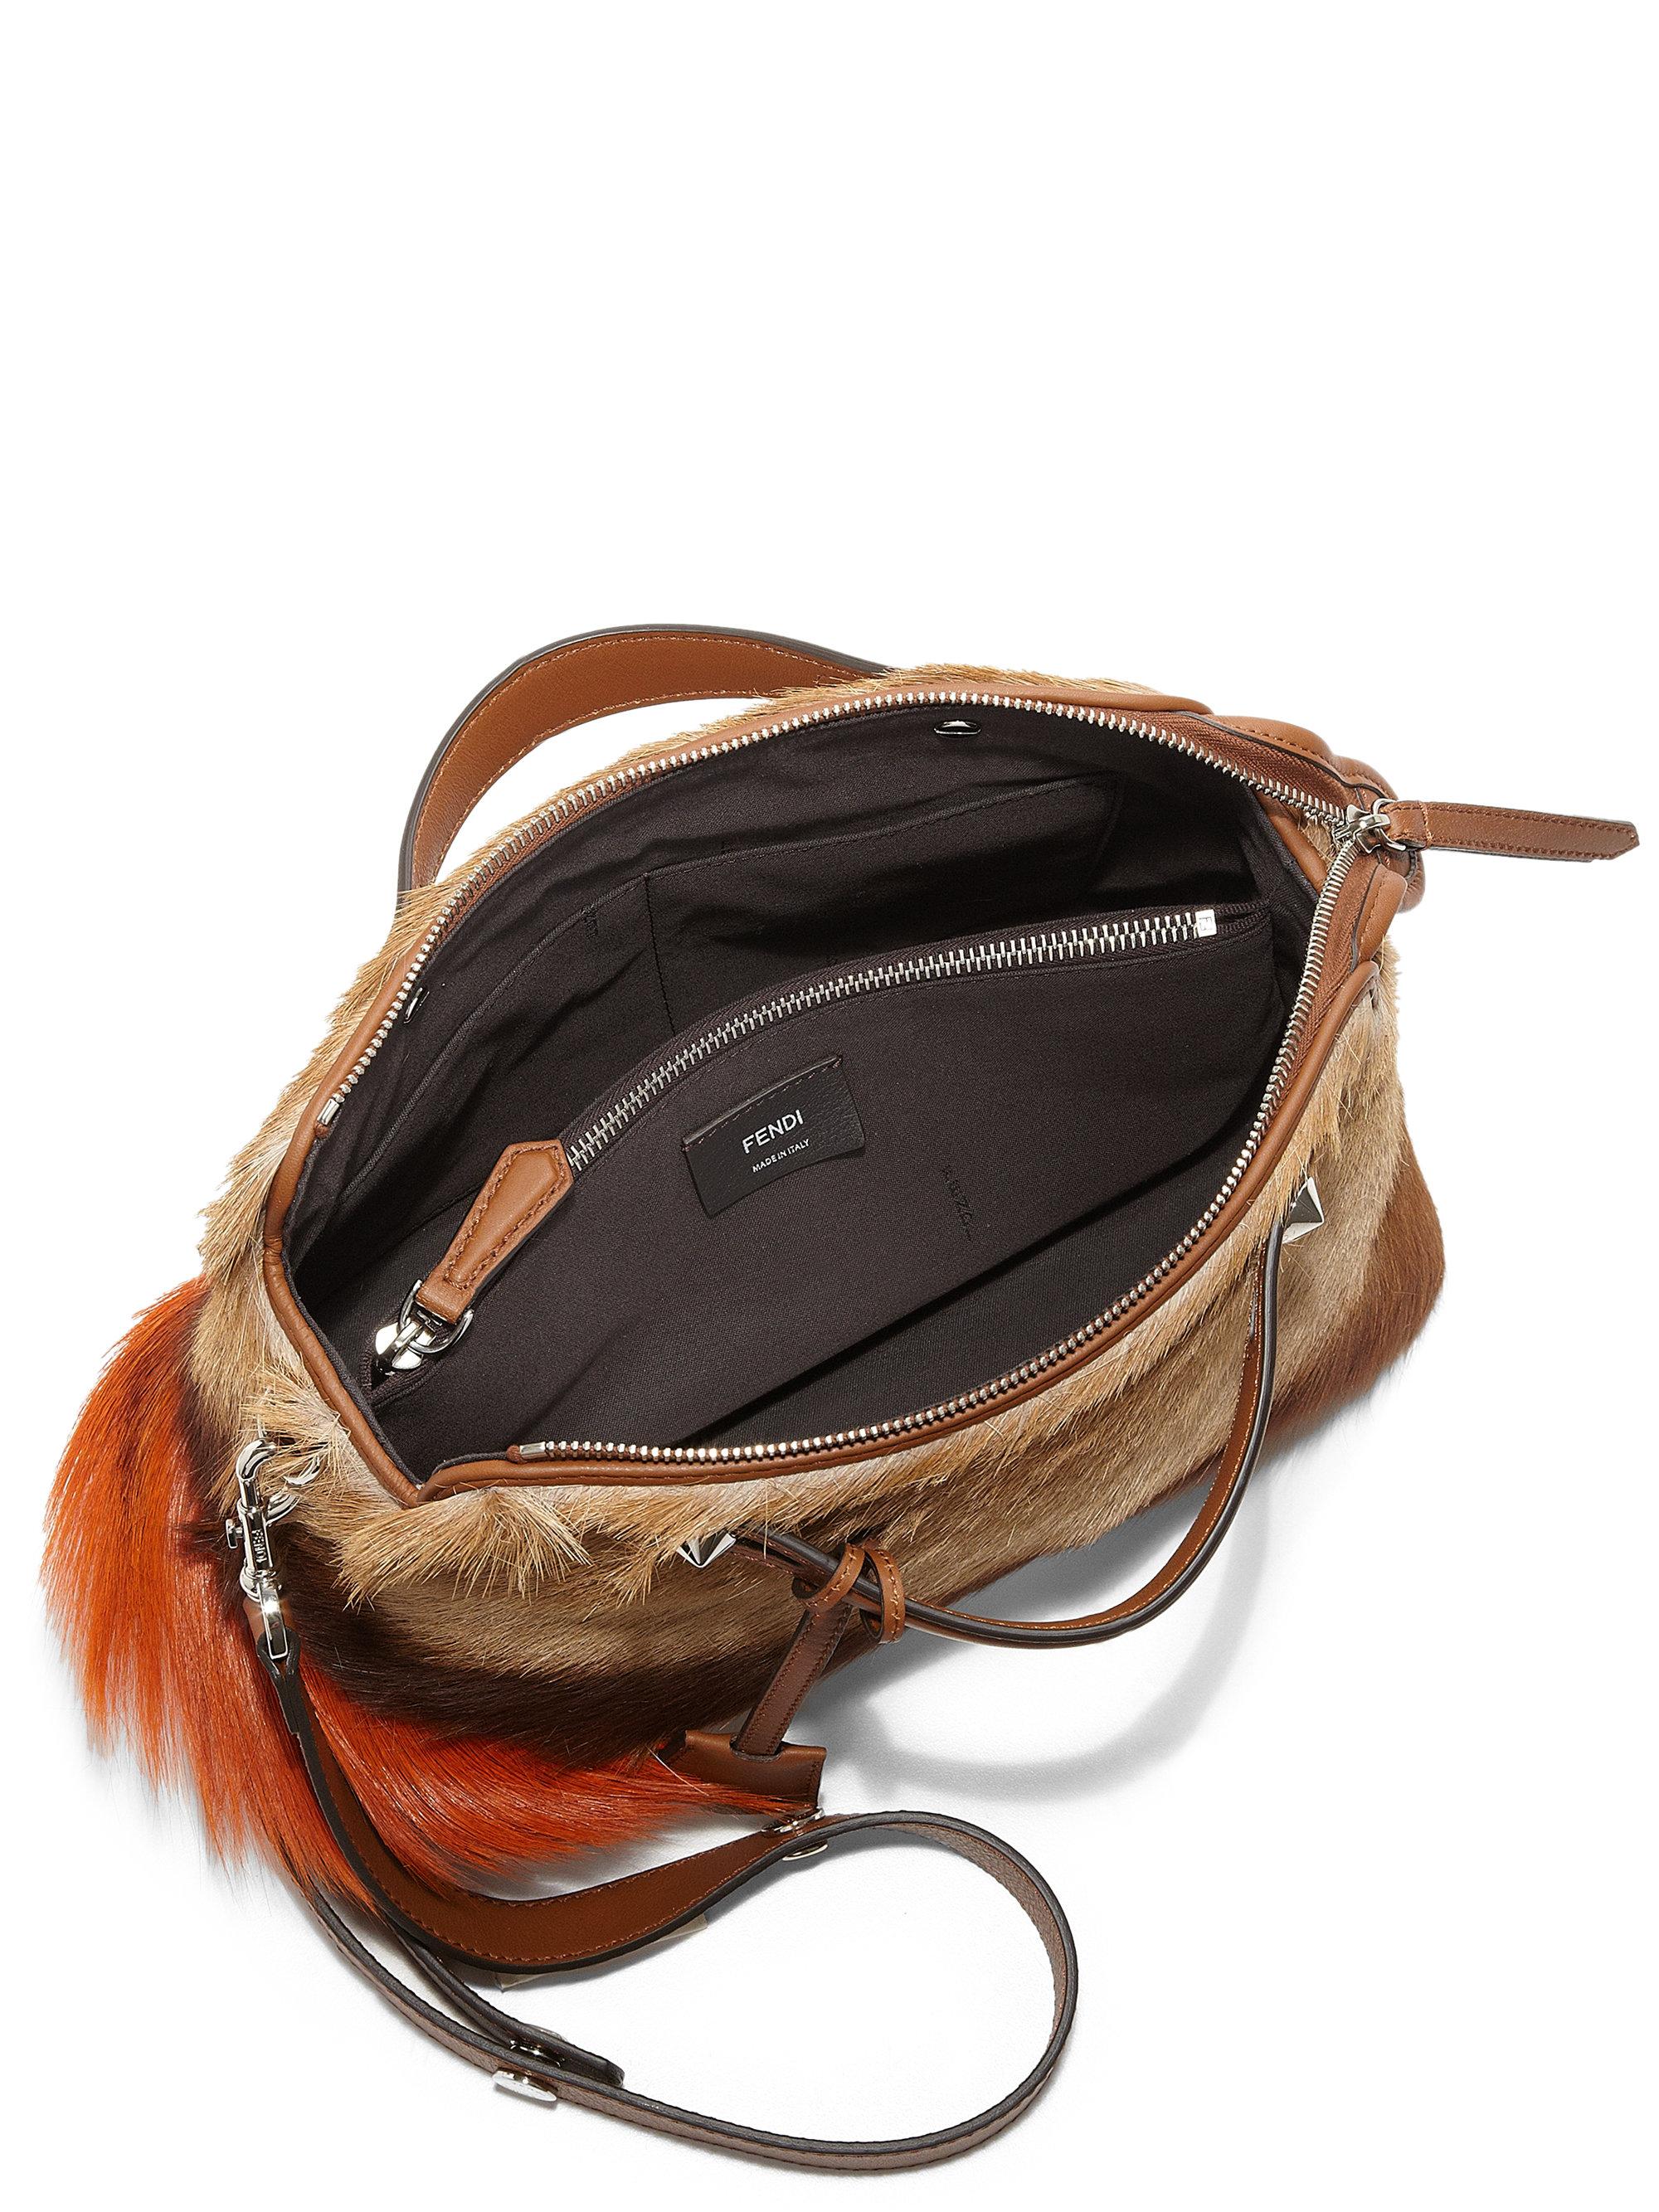 9ad4028e6b2 fendi handbags - Fendi By The Way Small Fur Satchel in Brown (TAN-MULTI